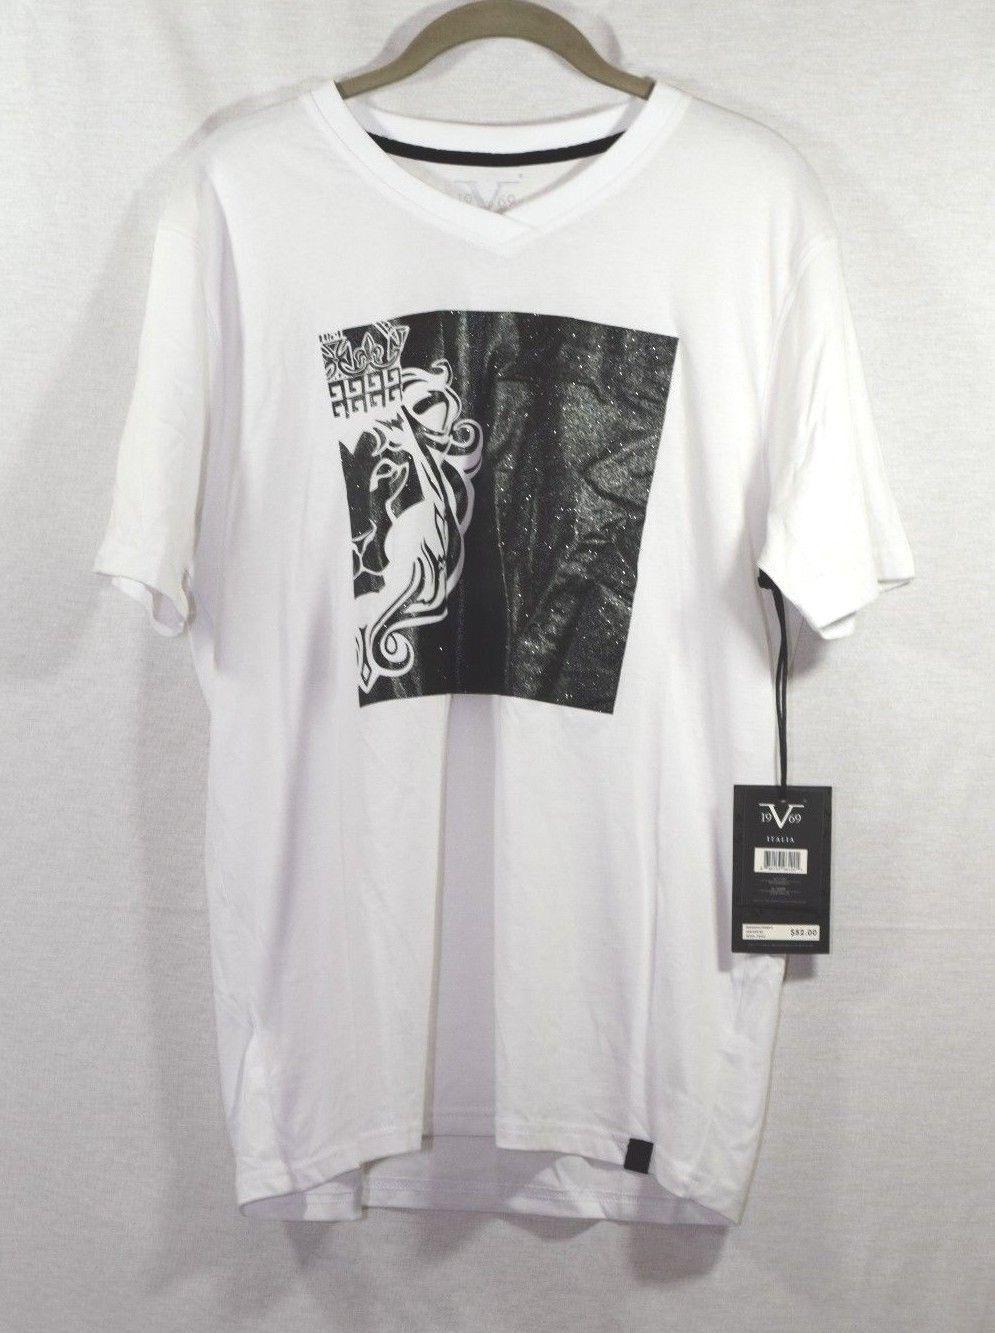 db034c30 28.99 | Versace V Italia 1969 Graphic Tee T Shirt White Lion Crew ...